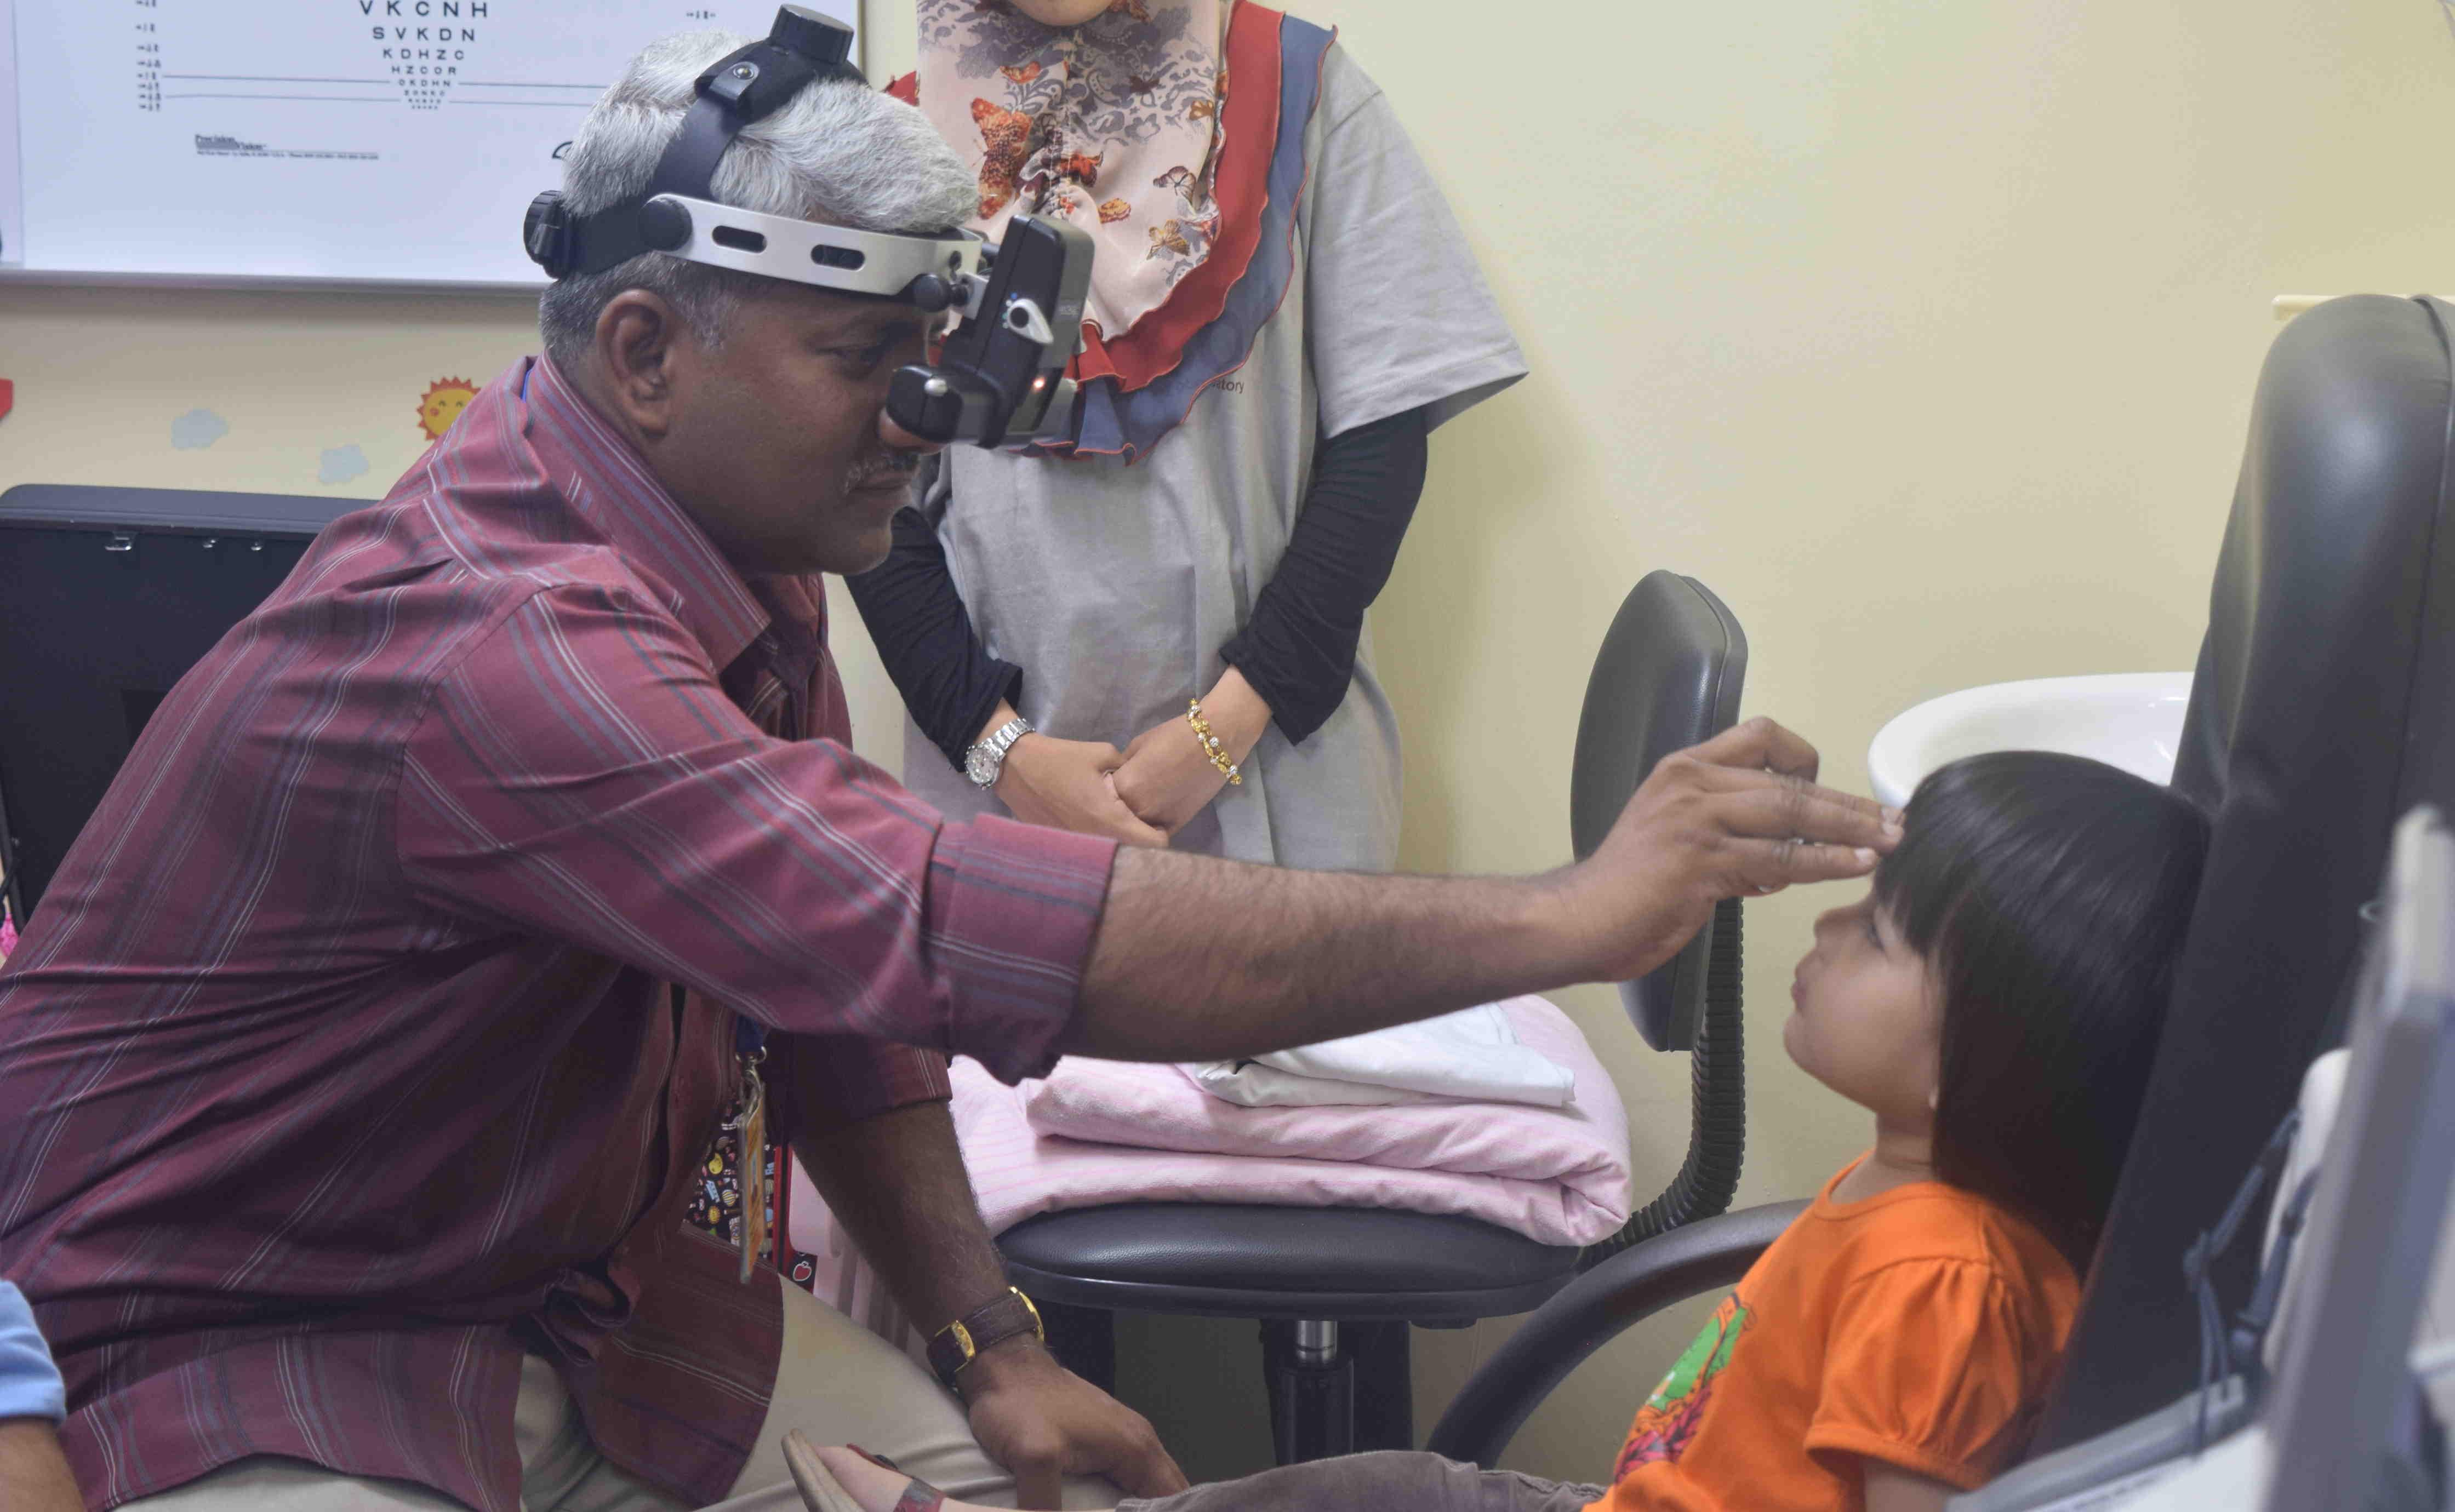 Segamat Paediatric Eye Disease Study (SEGPAEDS) - Check